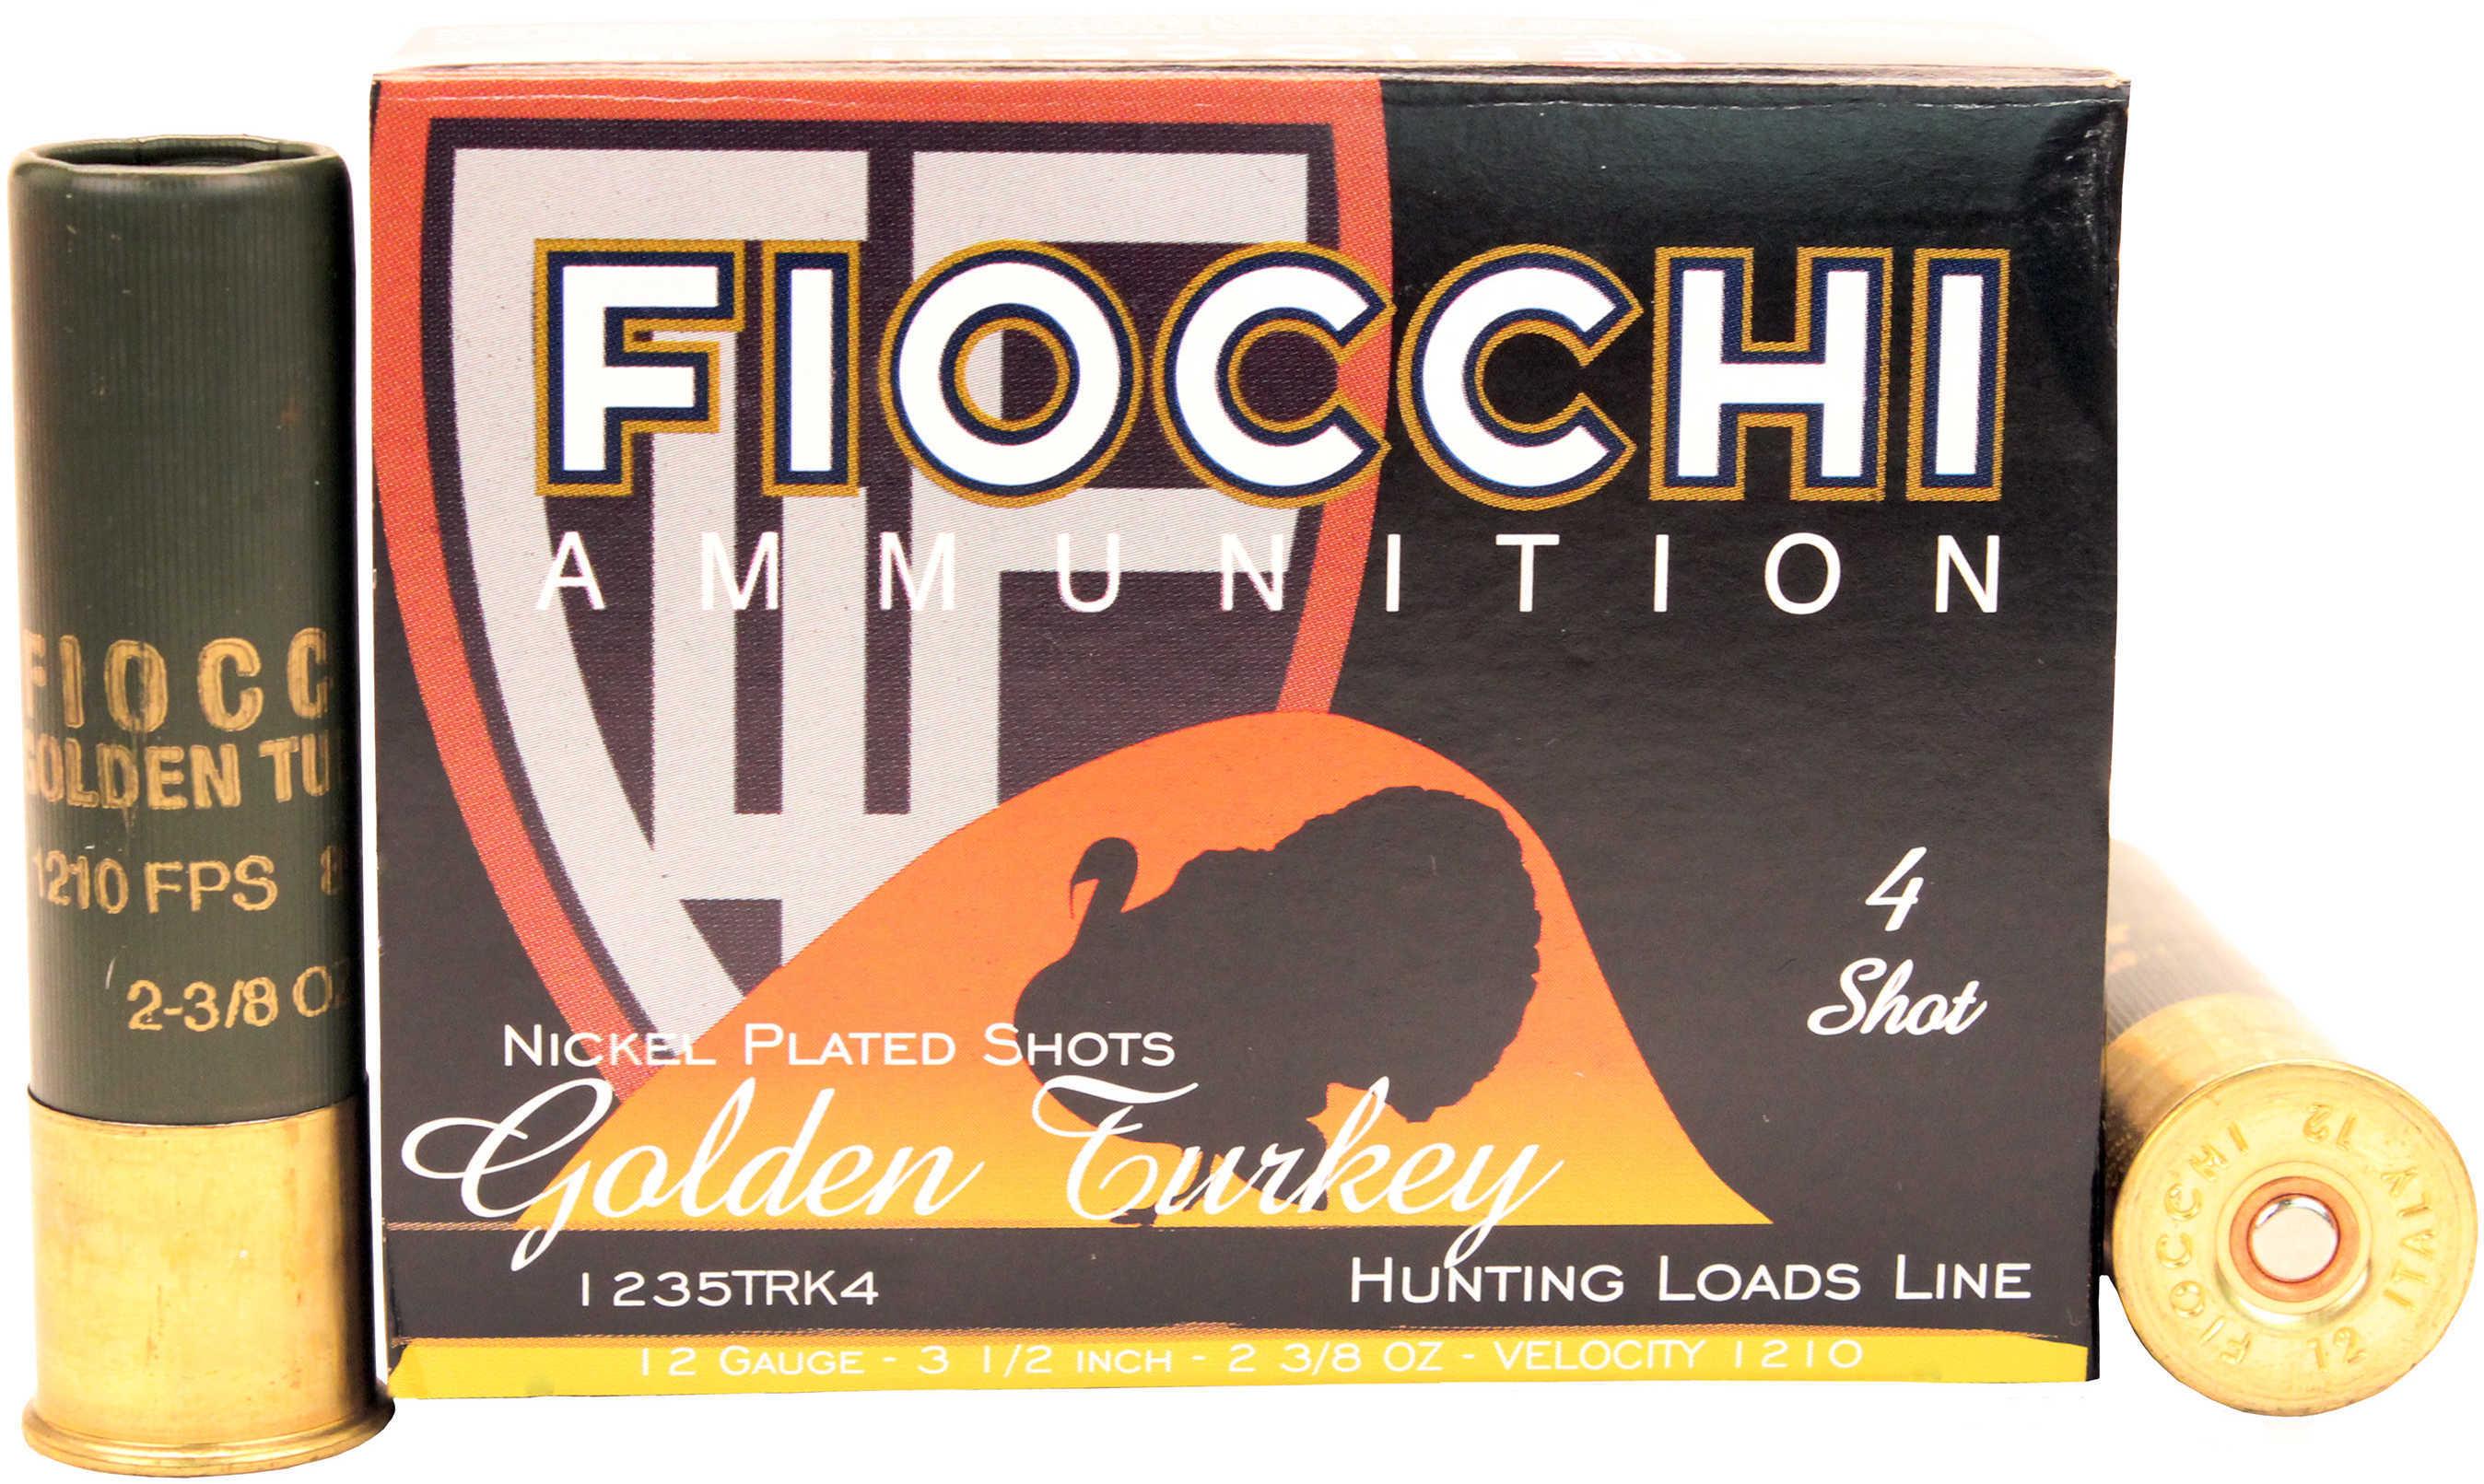 Fiocchi Golden Turkey 12 Gauge 3.5 Inch 2-3/8 Ounce #4 Shot Shotshells, 10 Rounds Per Box